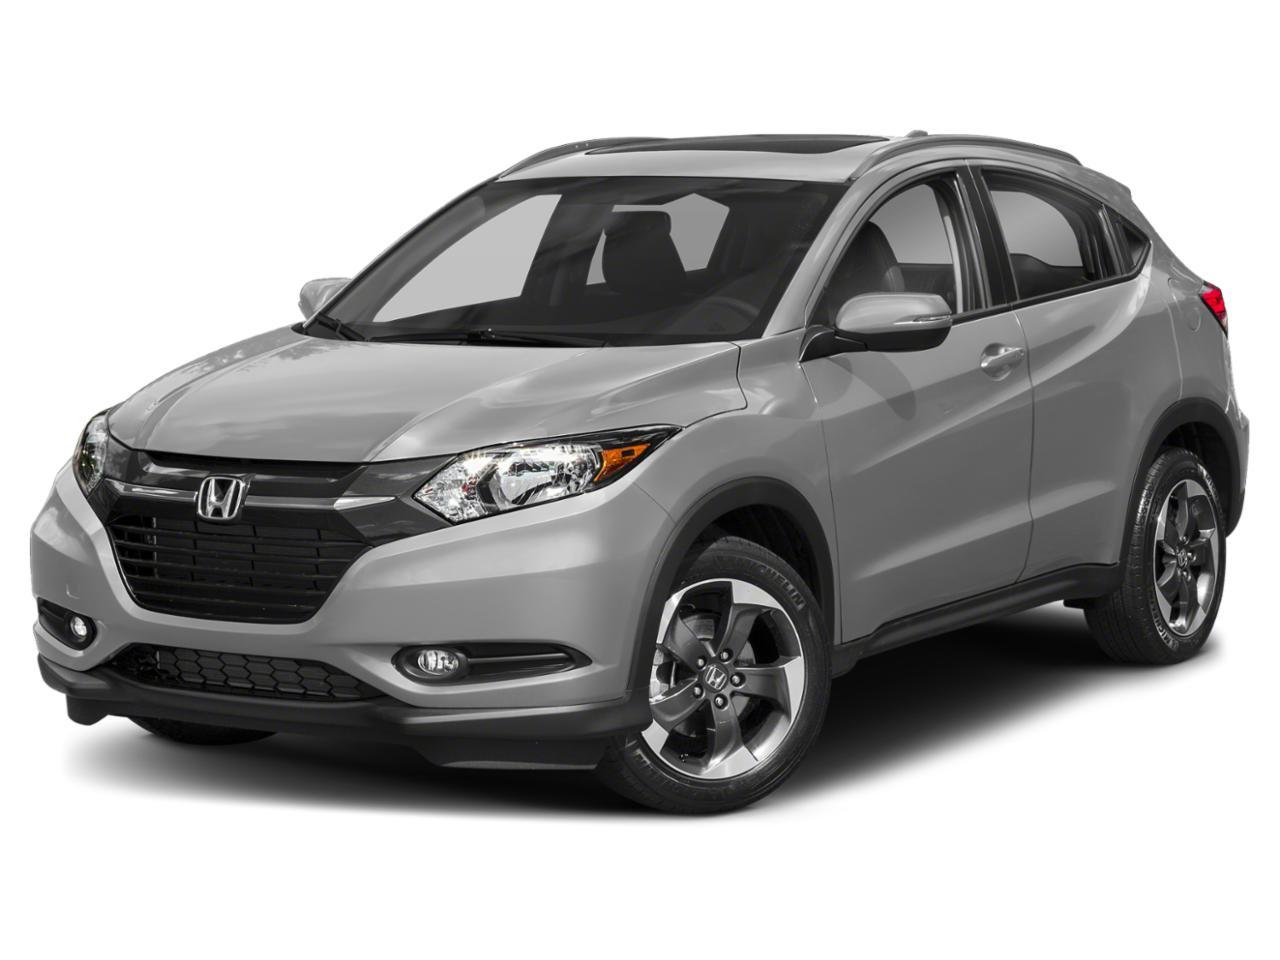 2018 Honda HR-V Vehicle Photo in Rockville, MD 20852